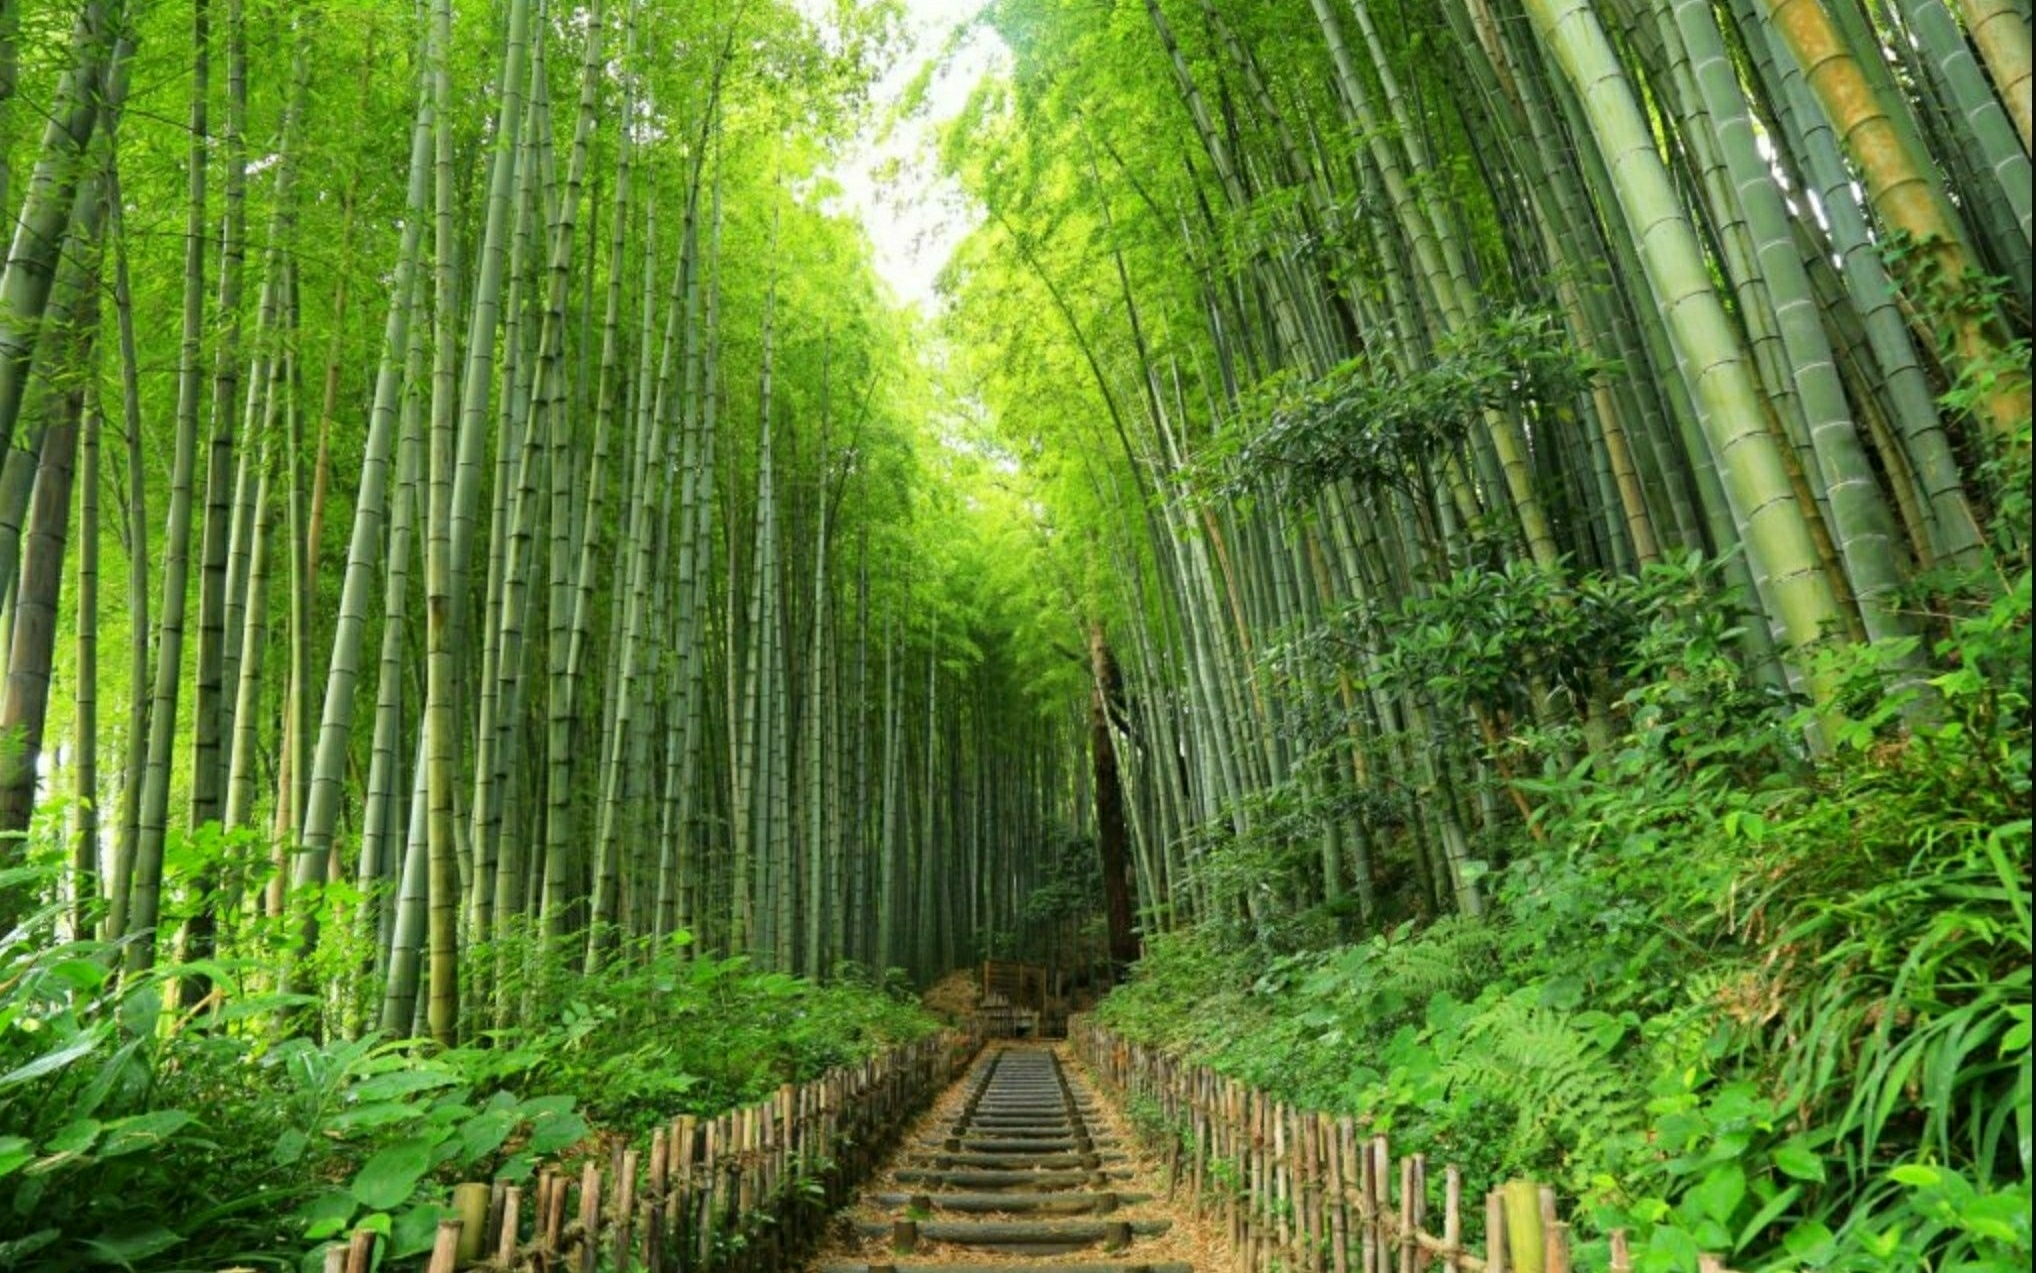 Old Samurai Road, 鵯坂 Hiyodori-zaka Slope, next to the Samurai residences. Feudal Samurai Retainers called 藩士 Hanshi used to go to the SAKURA castle by this sloping path!!